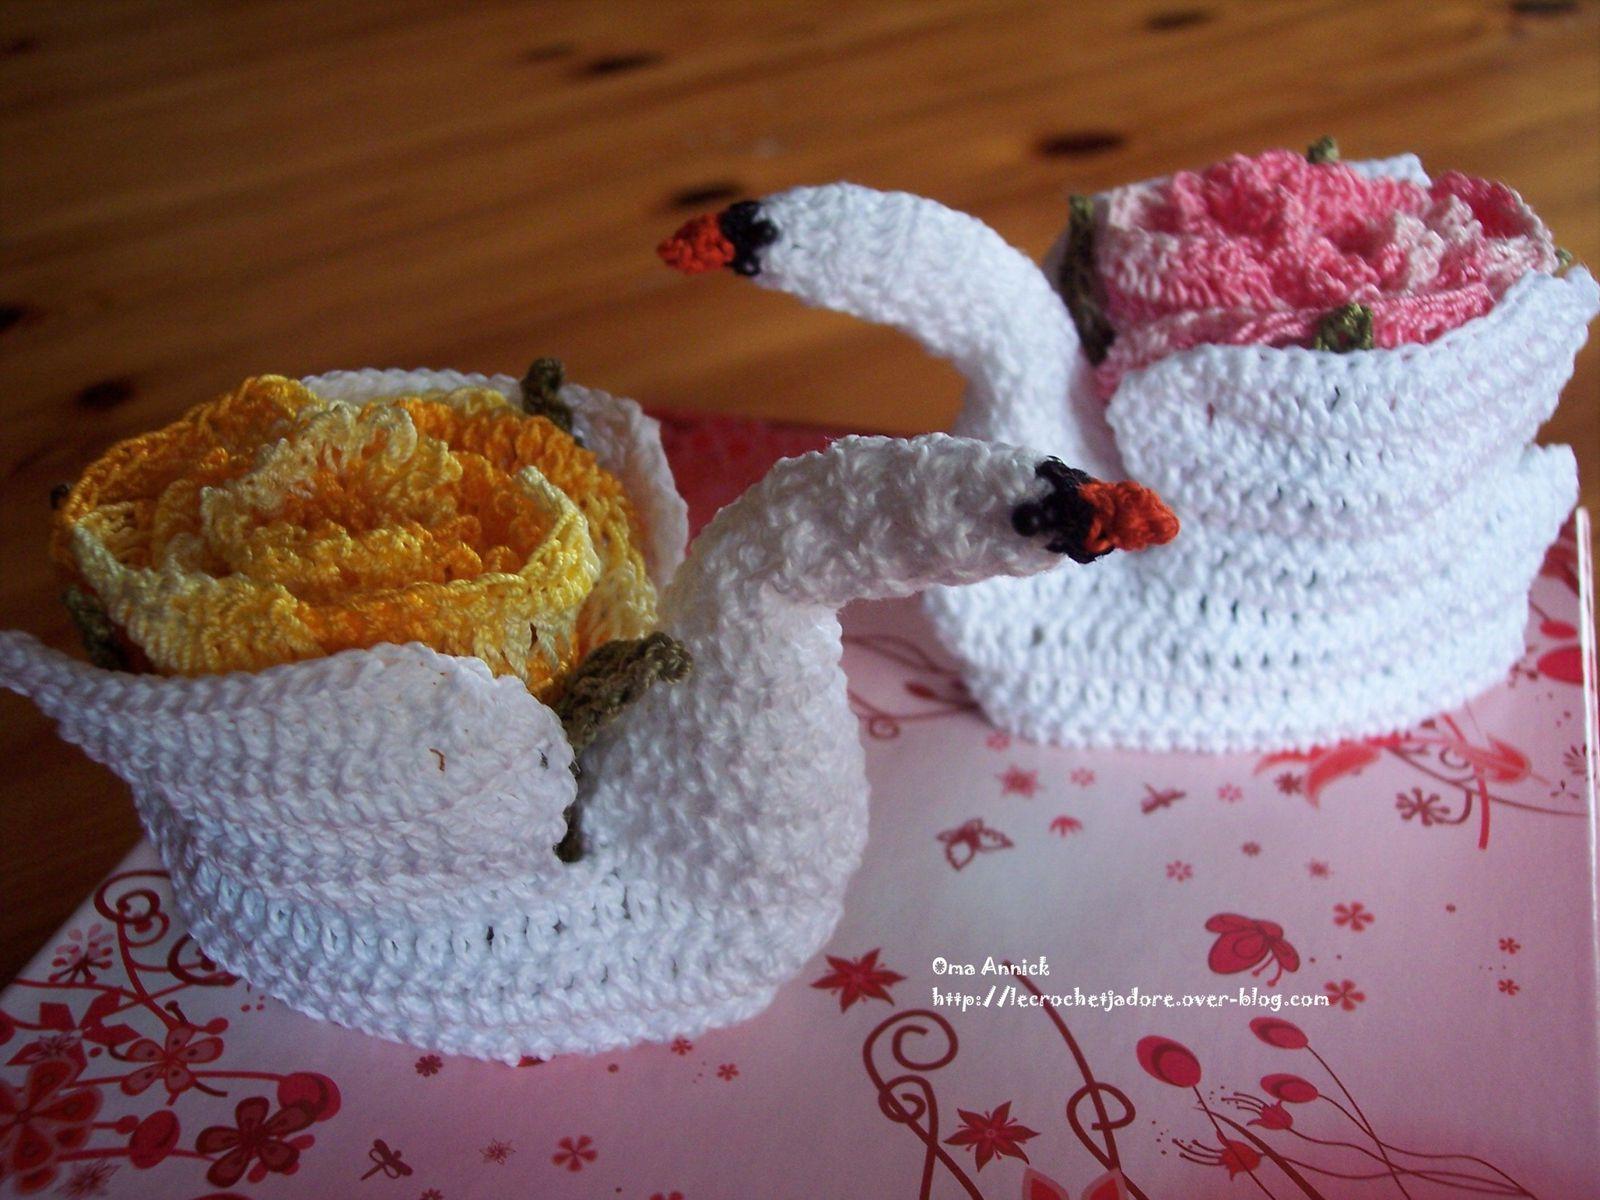 decoration crochet le blog de oma annick. Black Bedroom Furniture Sets. Home Design Ideas